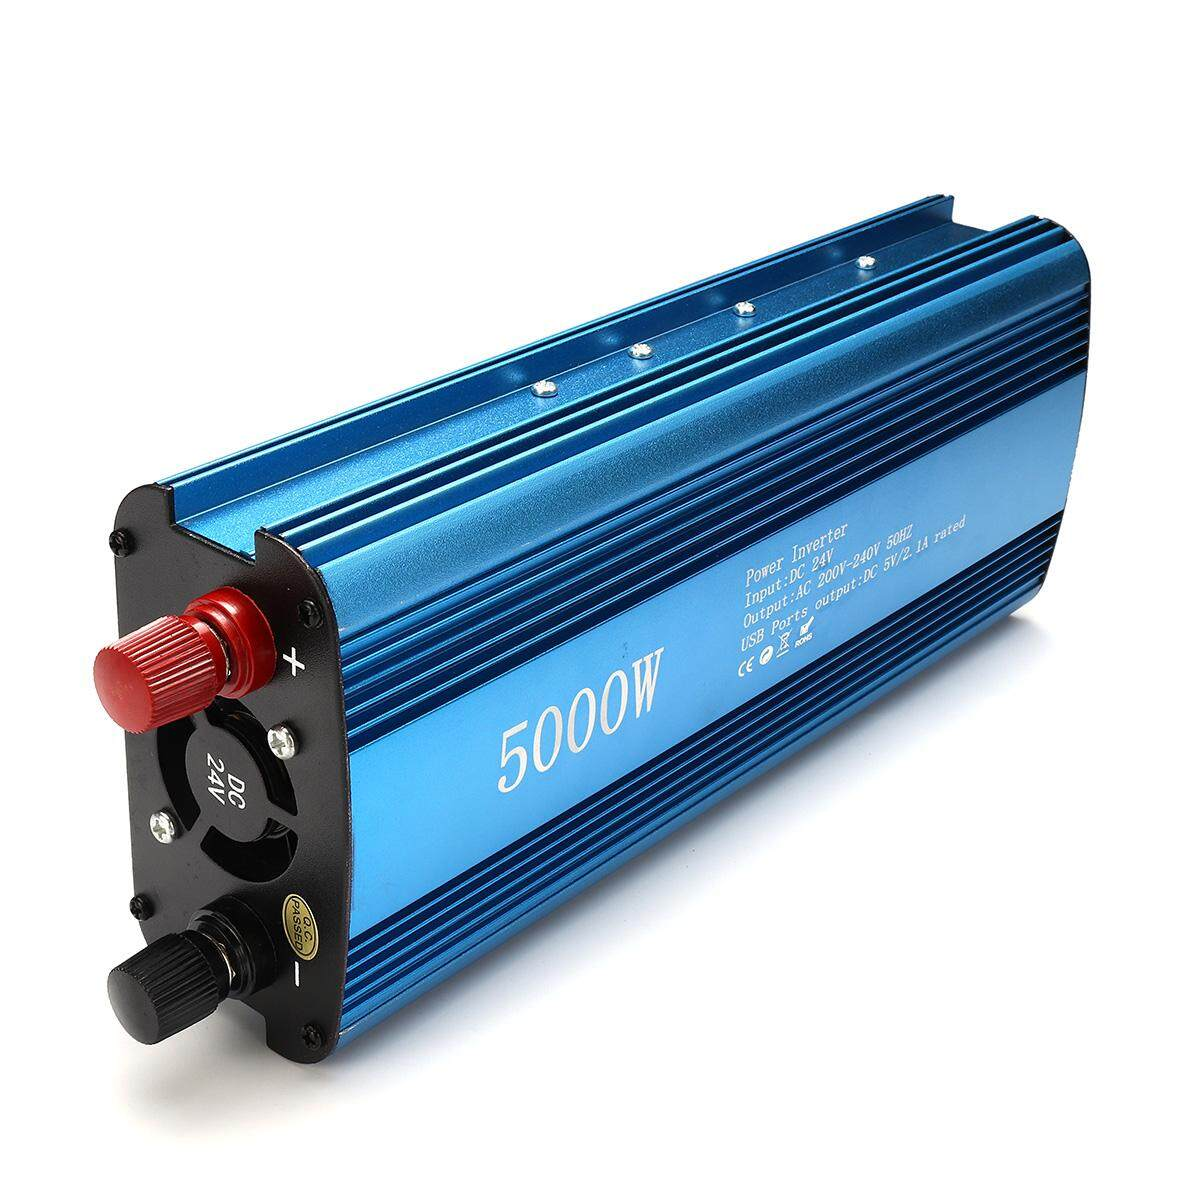 5000W DC 24V to AC 220V Solar Power Inverter LED Display Sine Wave USB Converter - intl